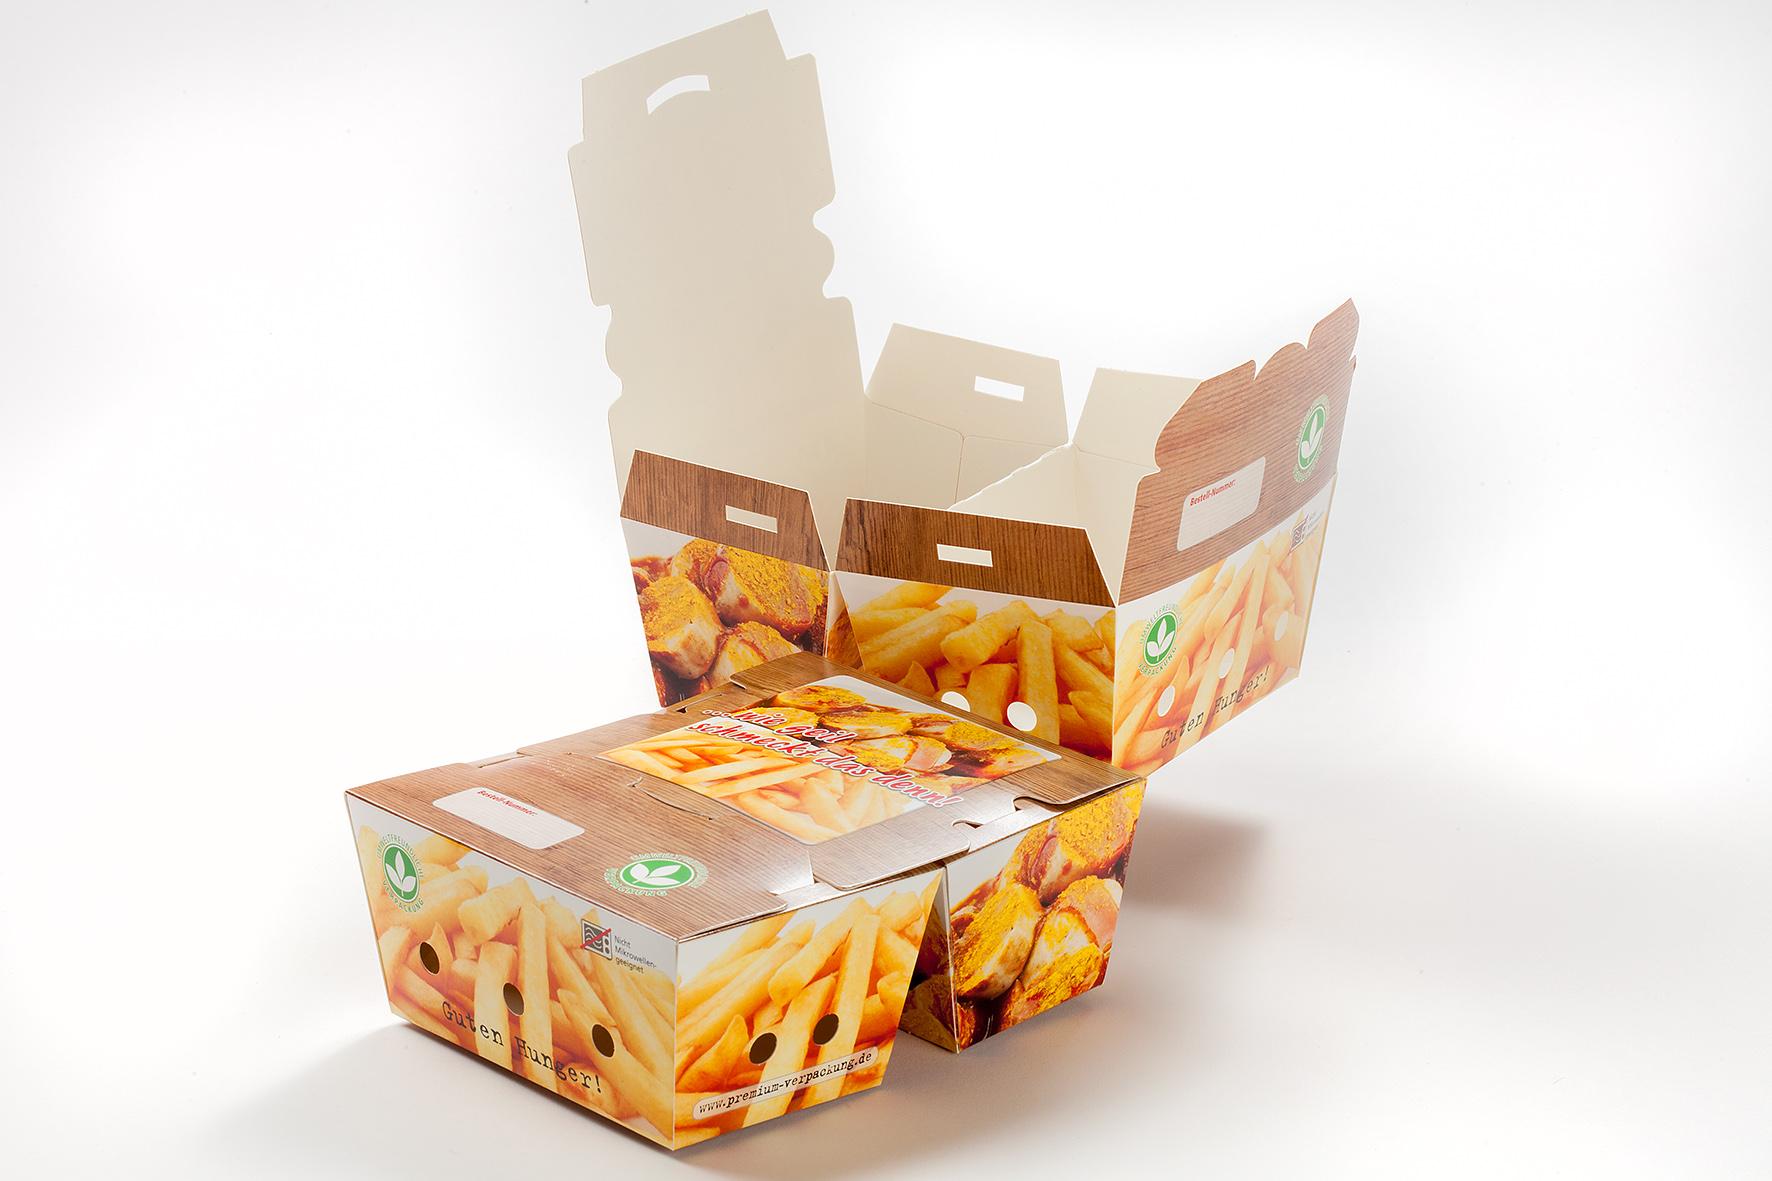 Schnitzel Joker Curry Wurst Pommes Kombibox